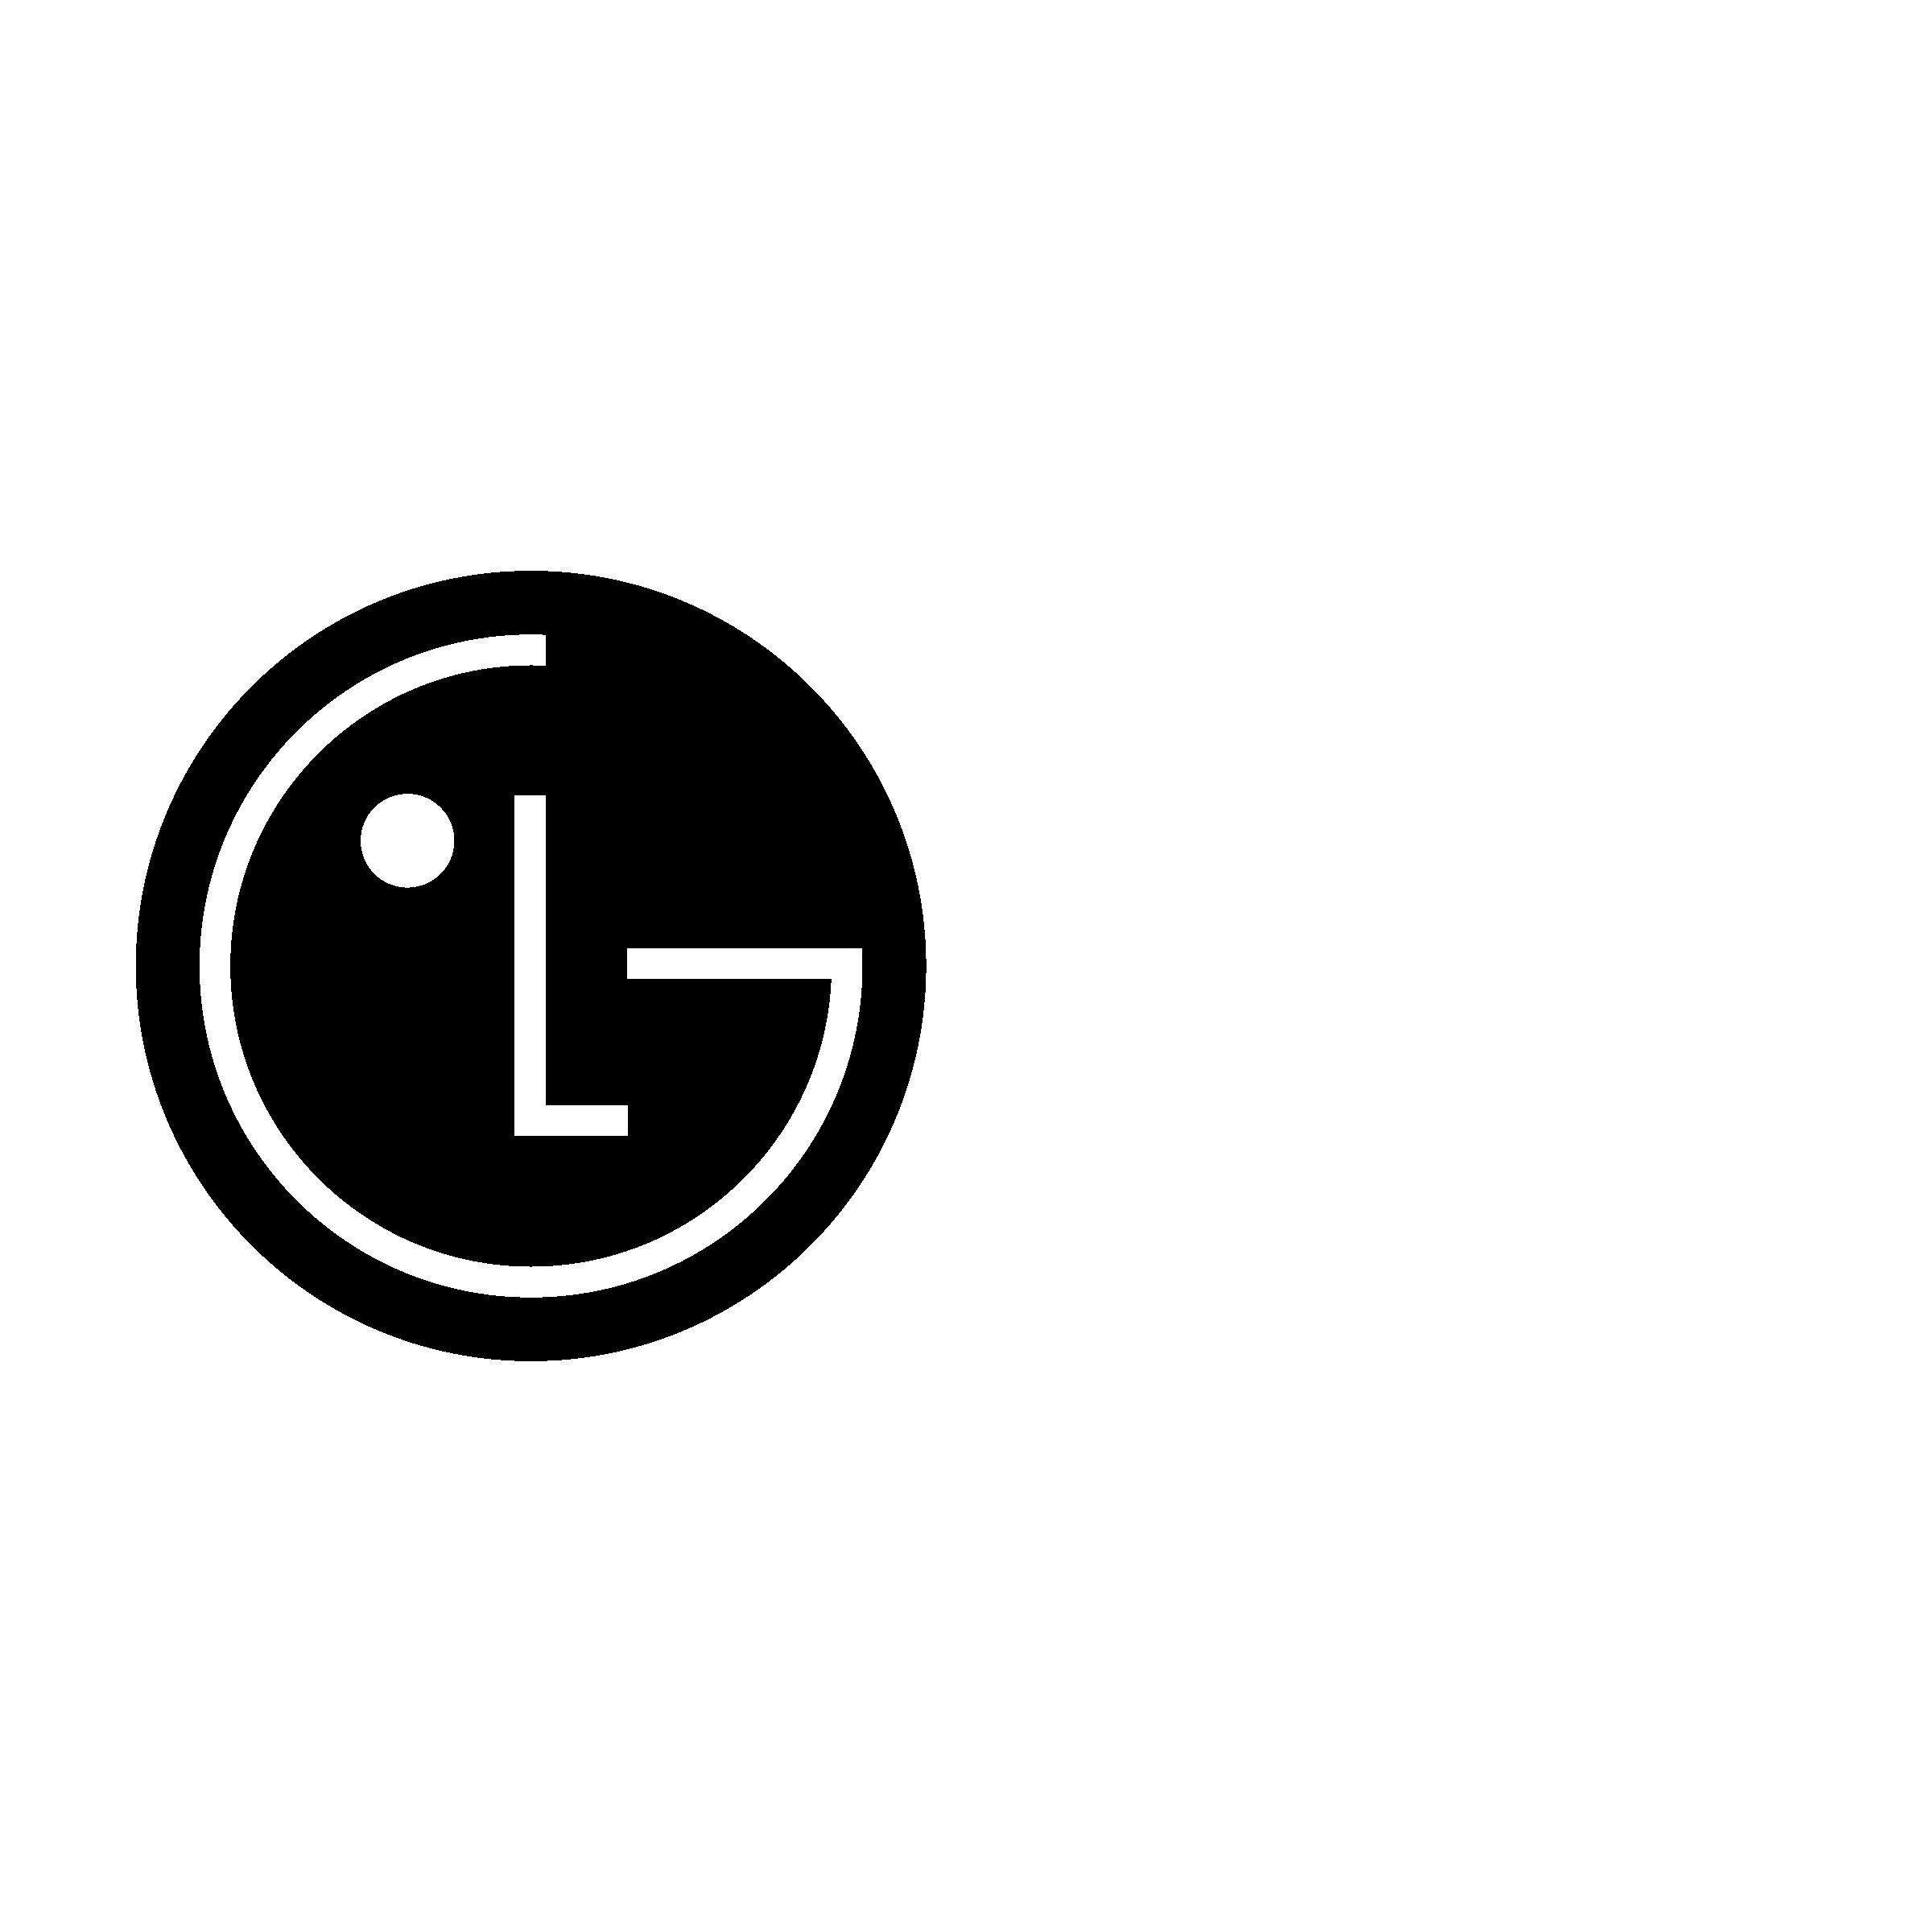 Electronic Logos Black Great Installation Of Wiring Diagram Electronics Symbols Lg Logo Transparent Svg Vector Freebie Supply Rh Freebiesupply Com Clip Art